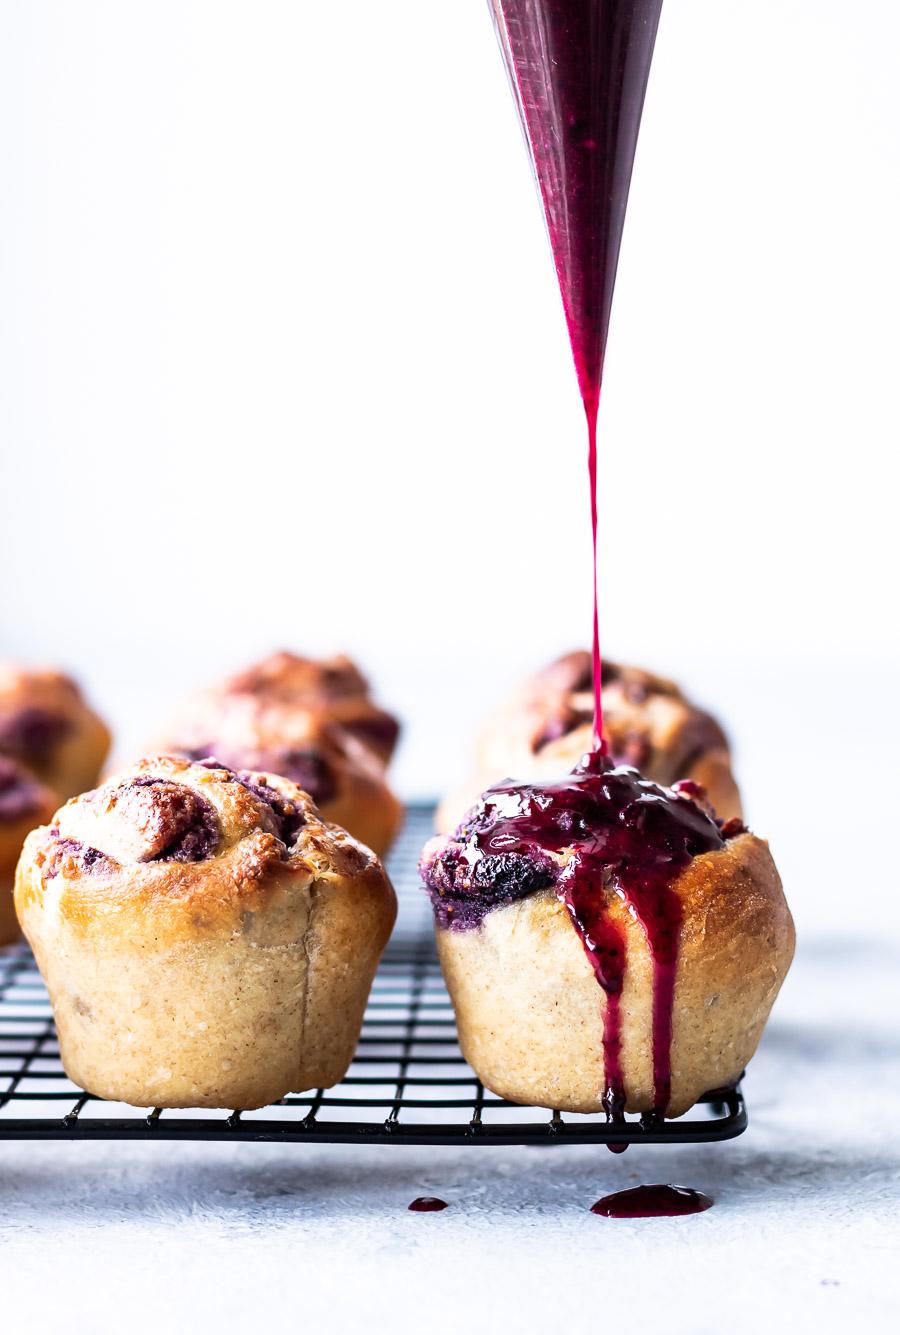 Blåbærsnegle i muffinforme